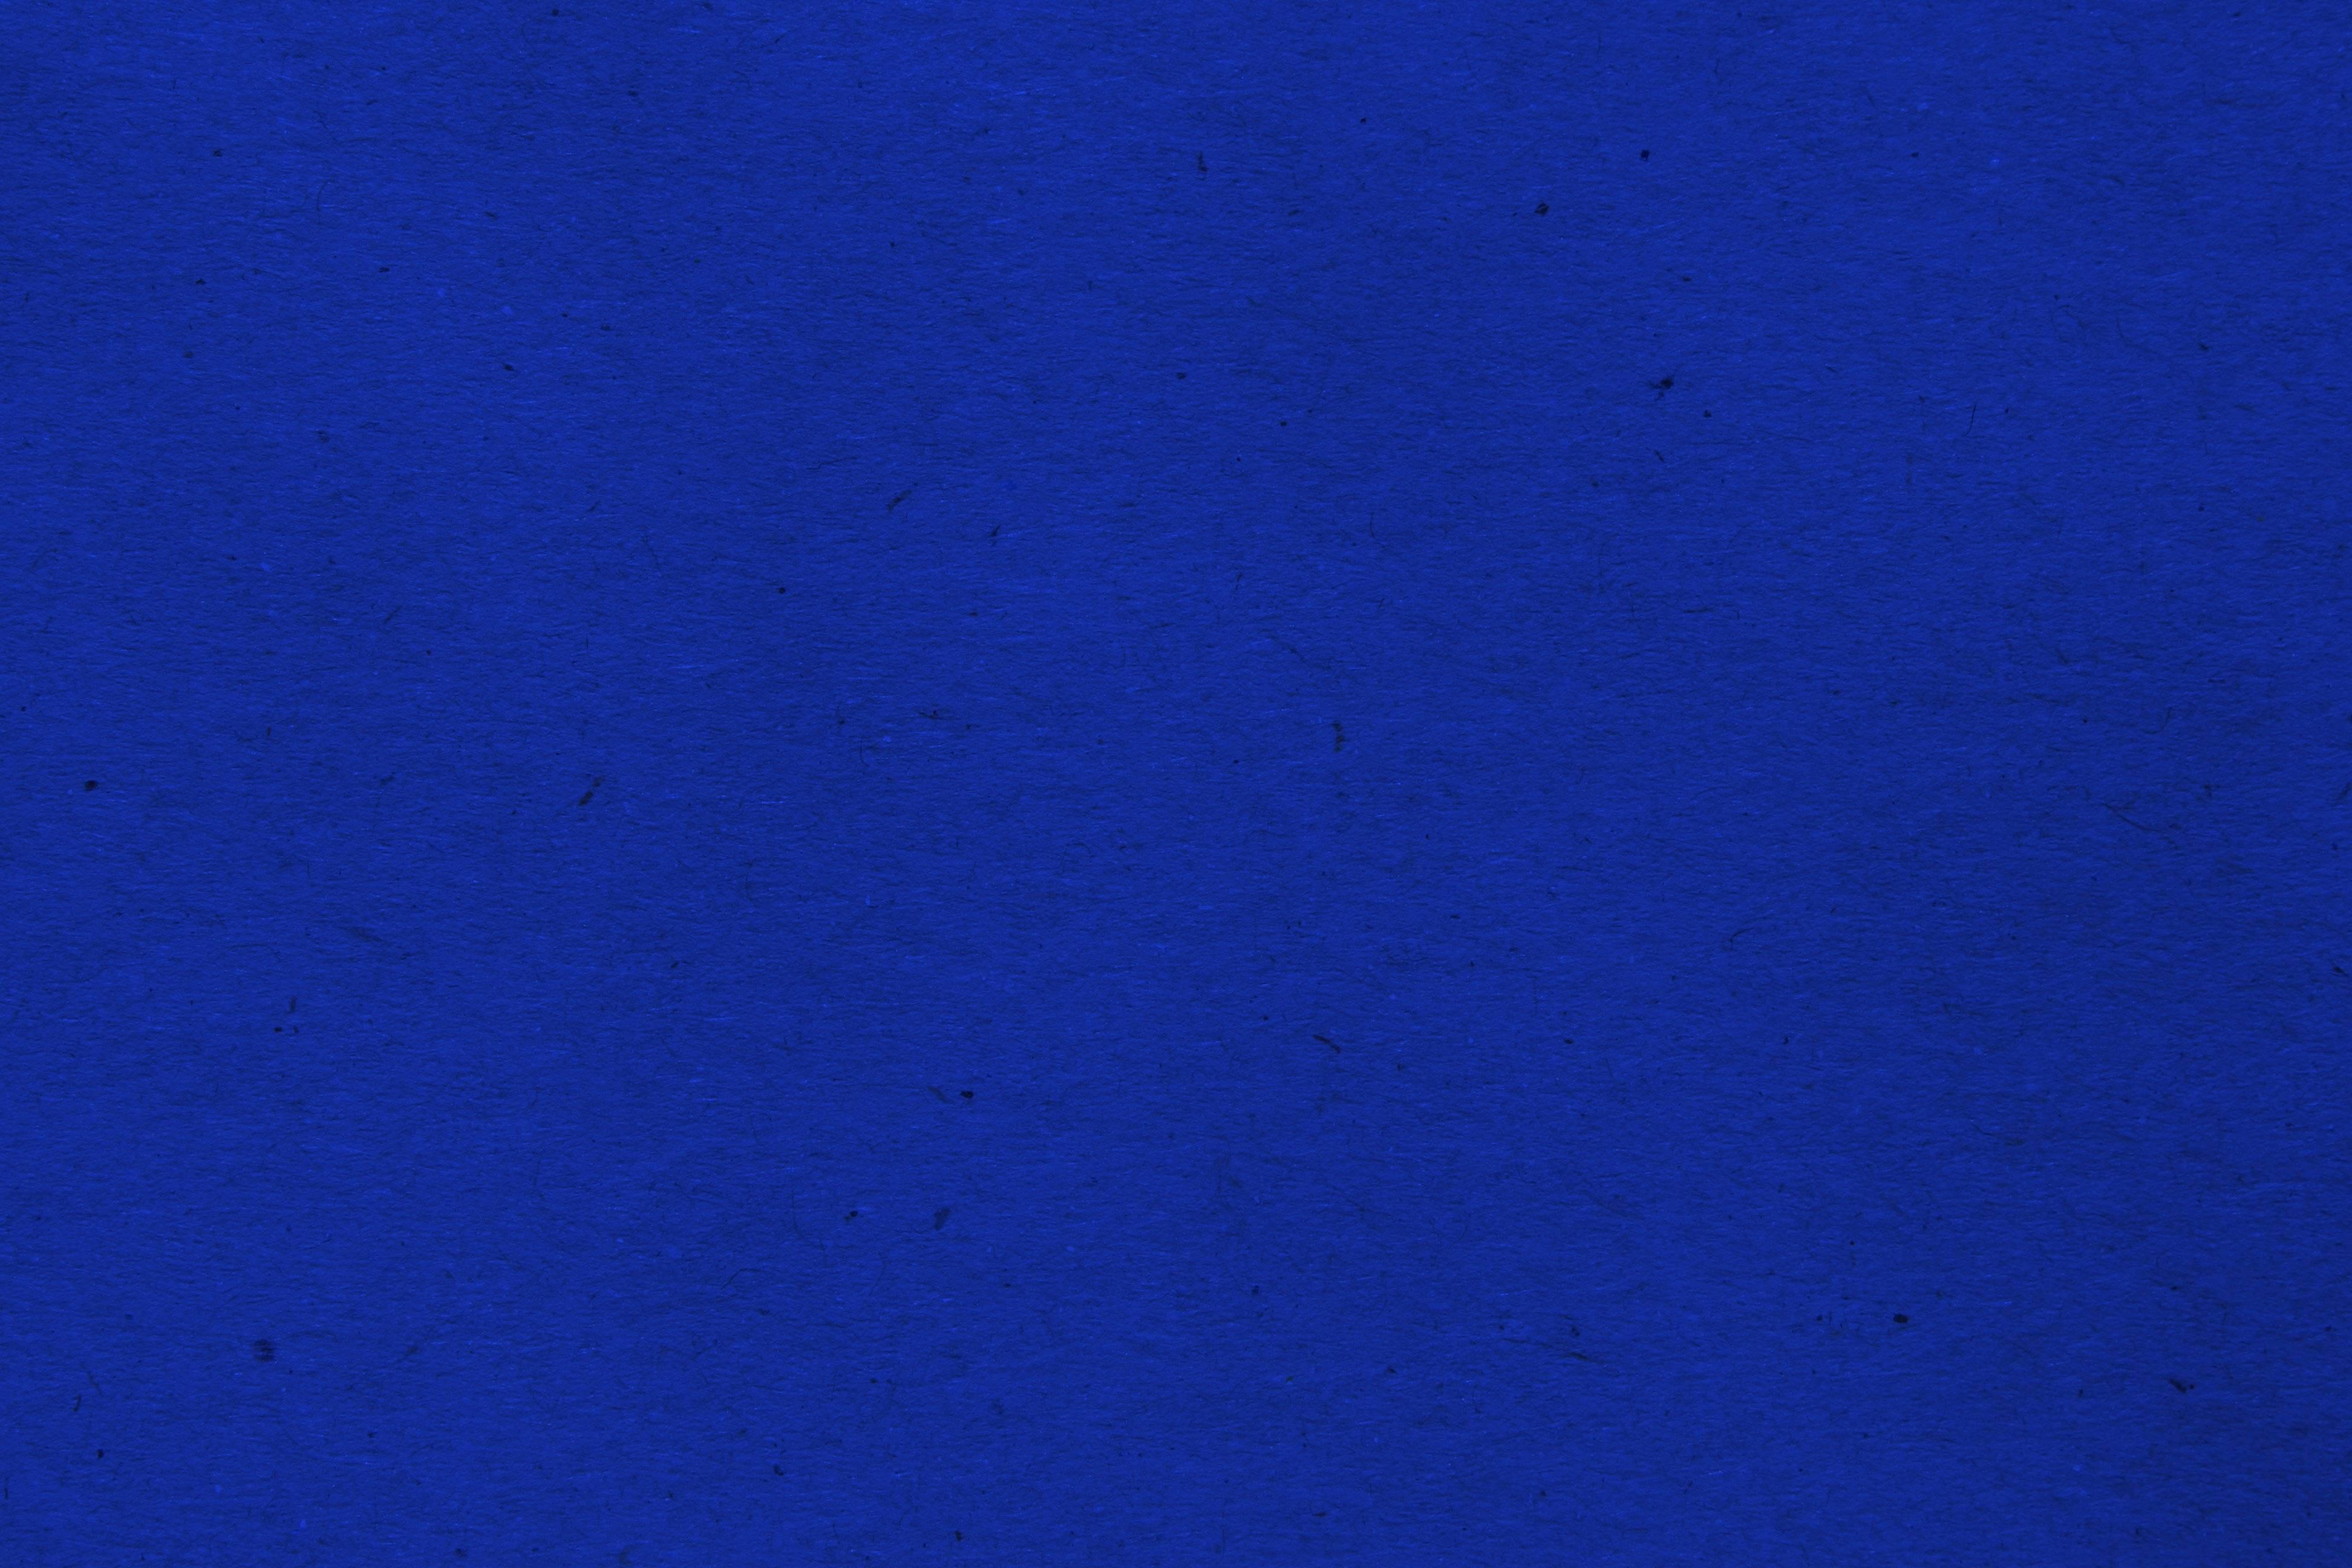 deep blue backgrounds wallpaper cave